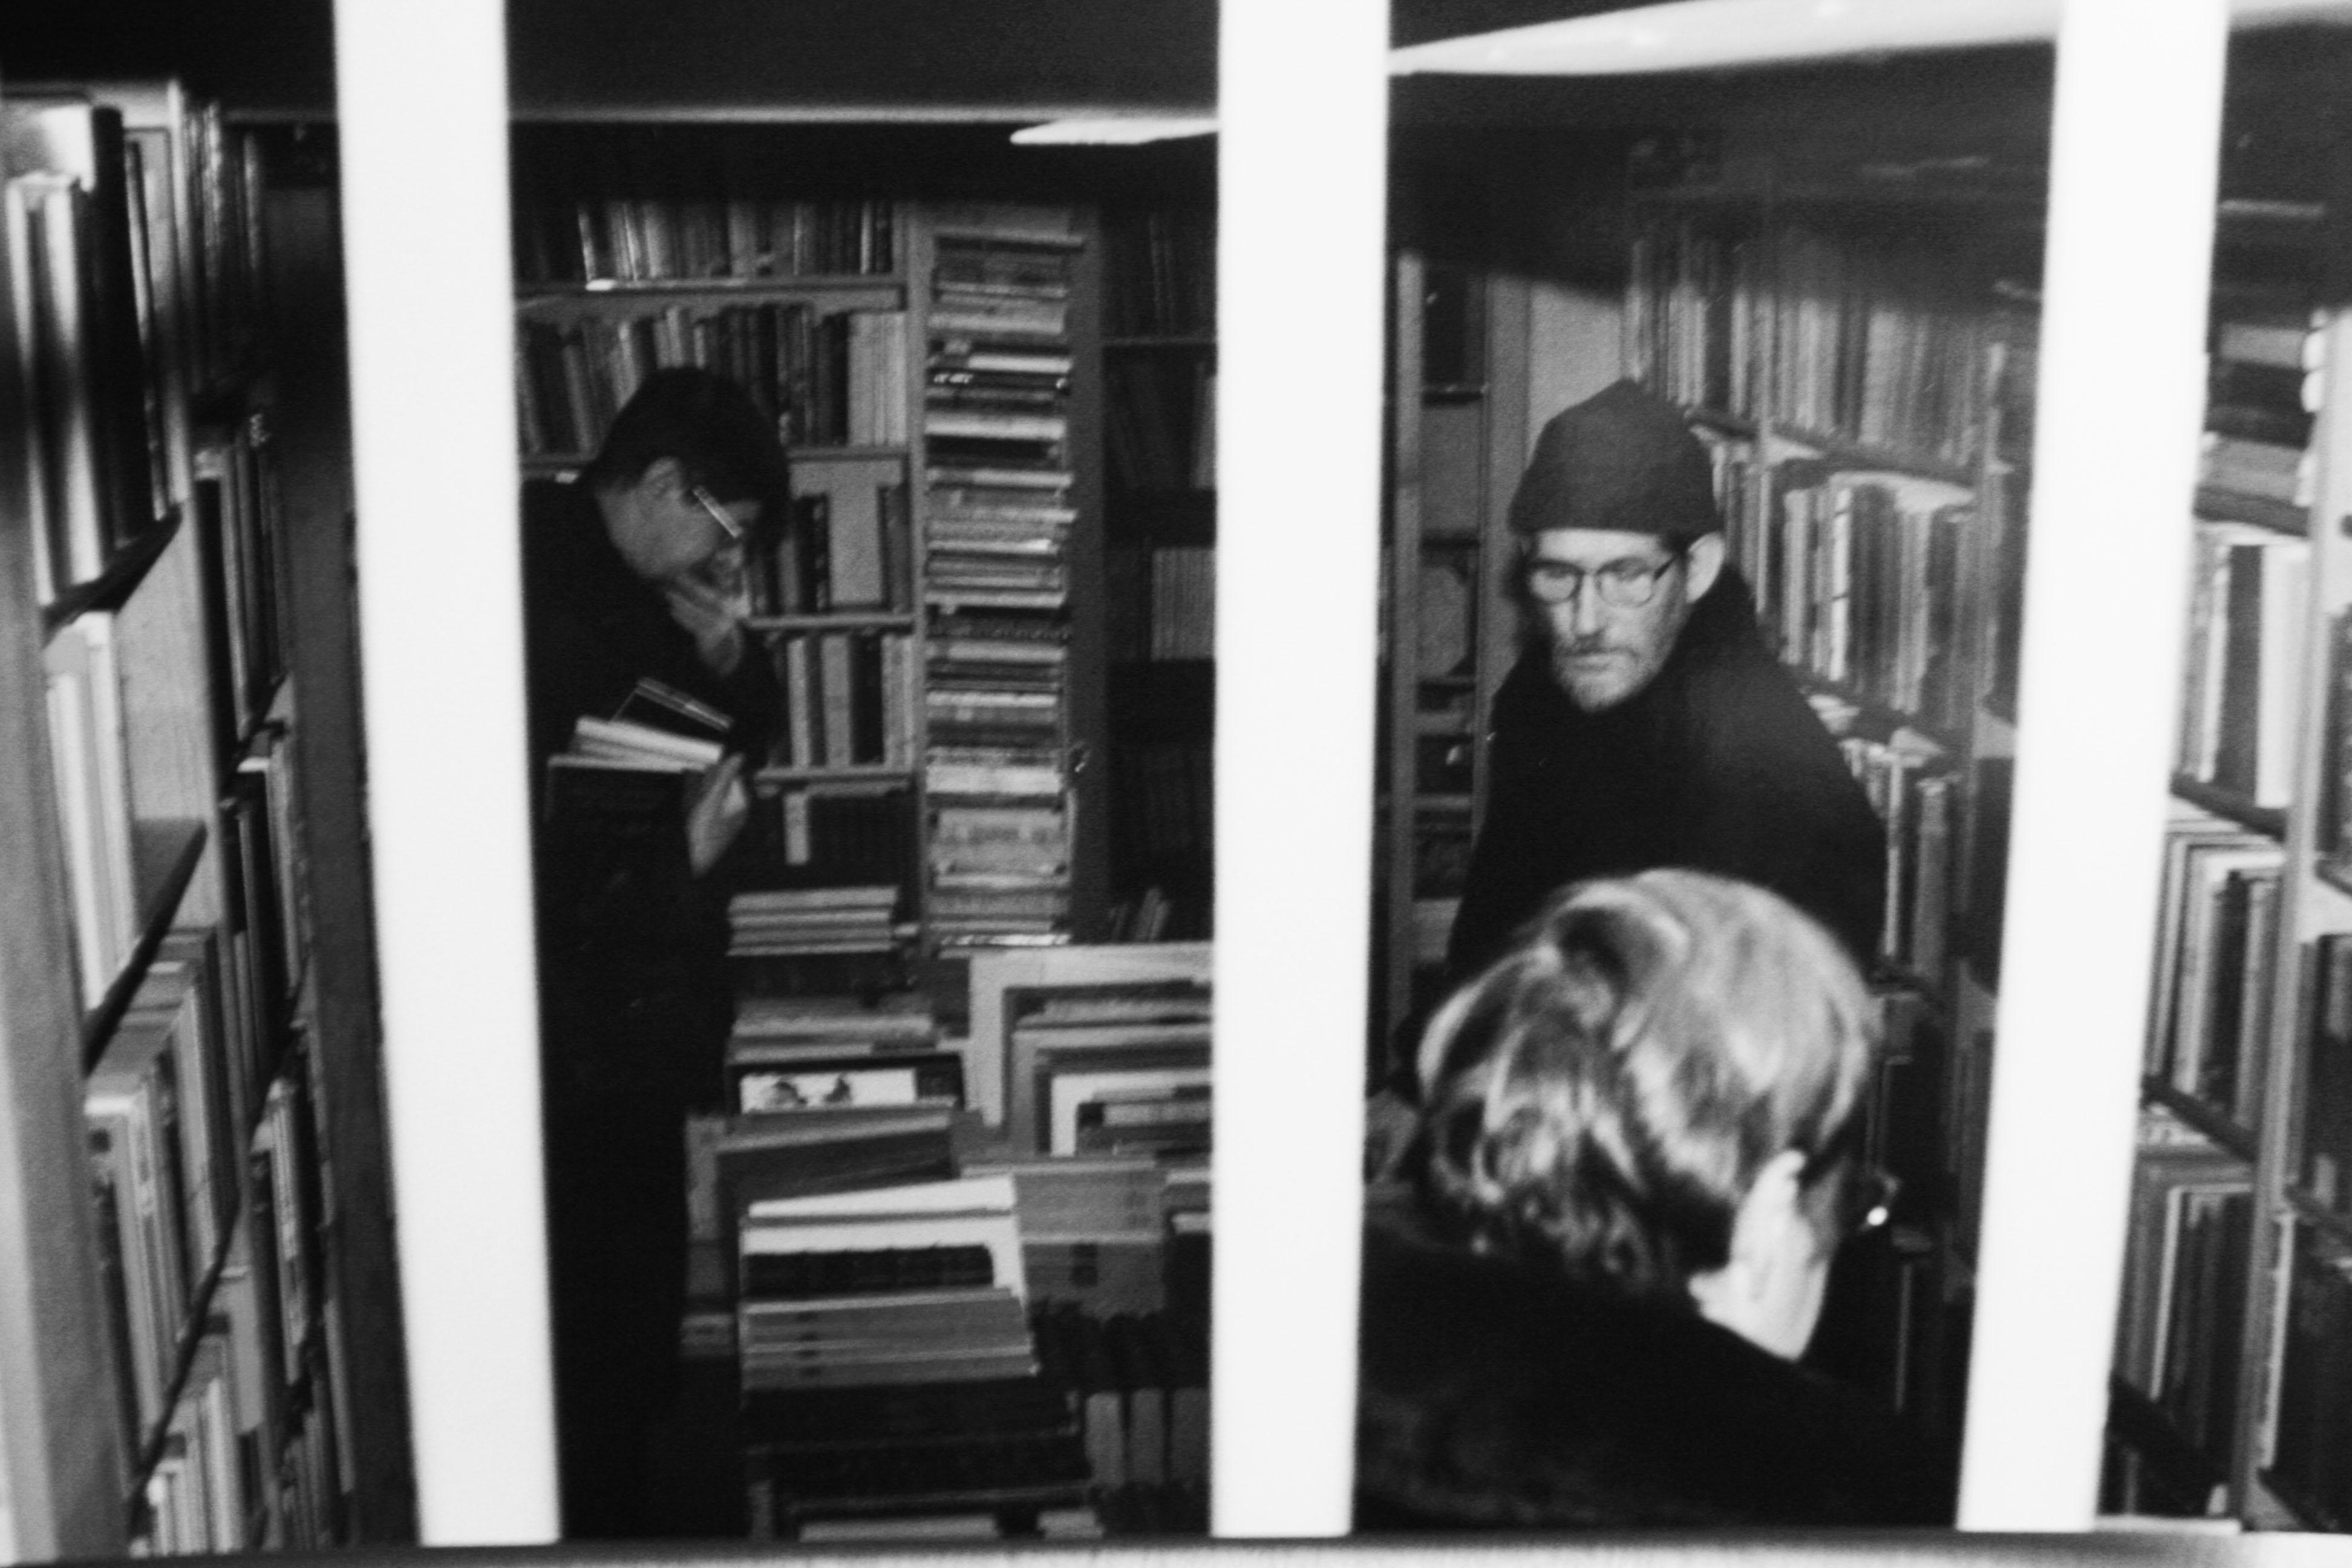 clemens kælderen 1996